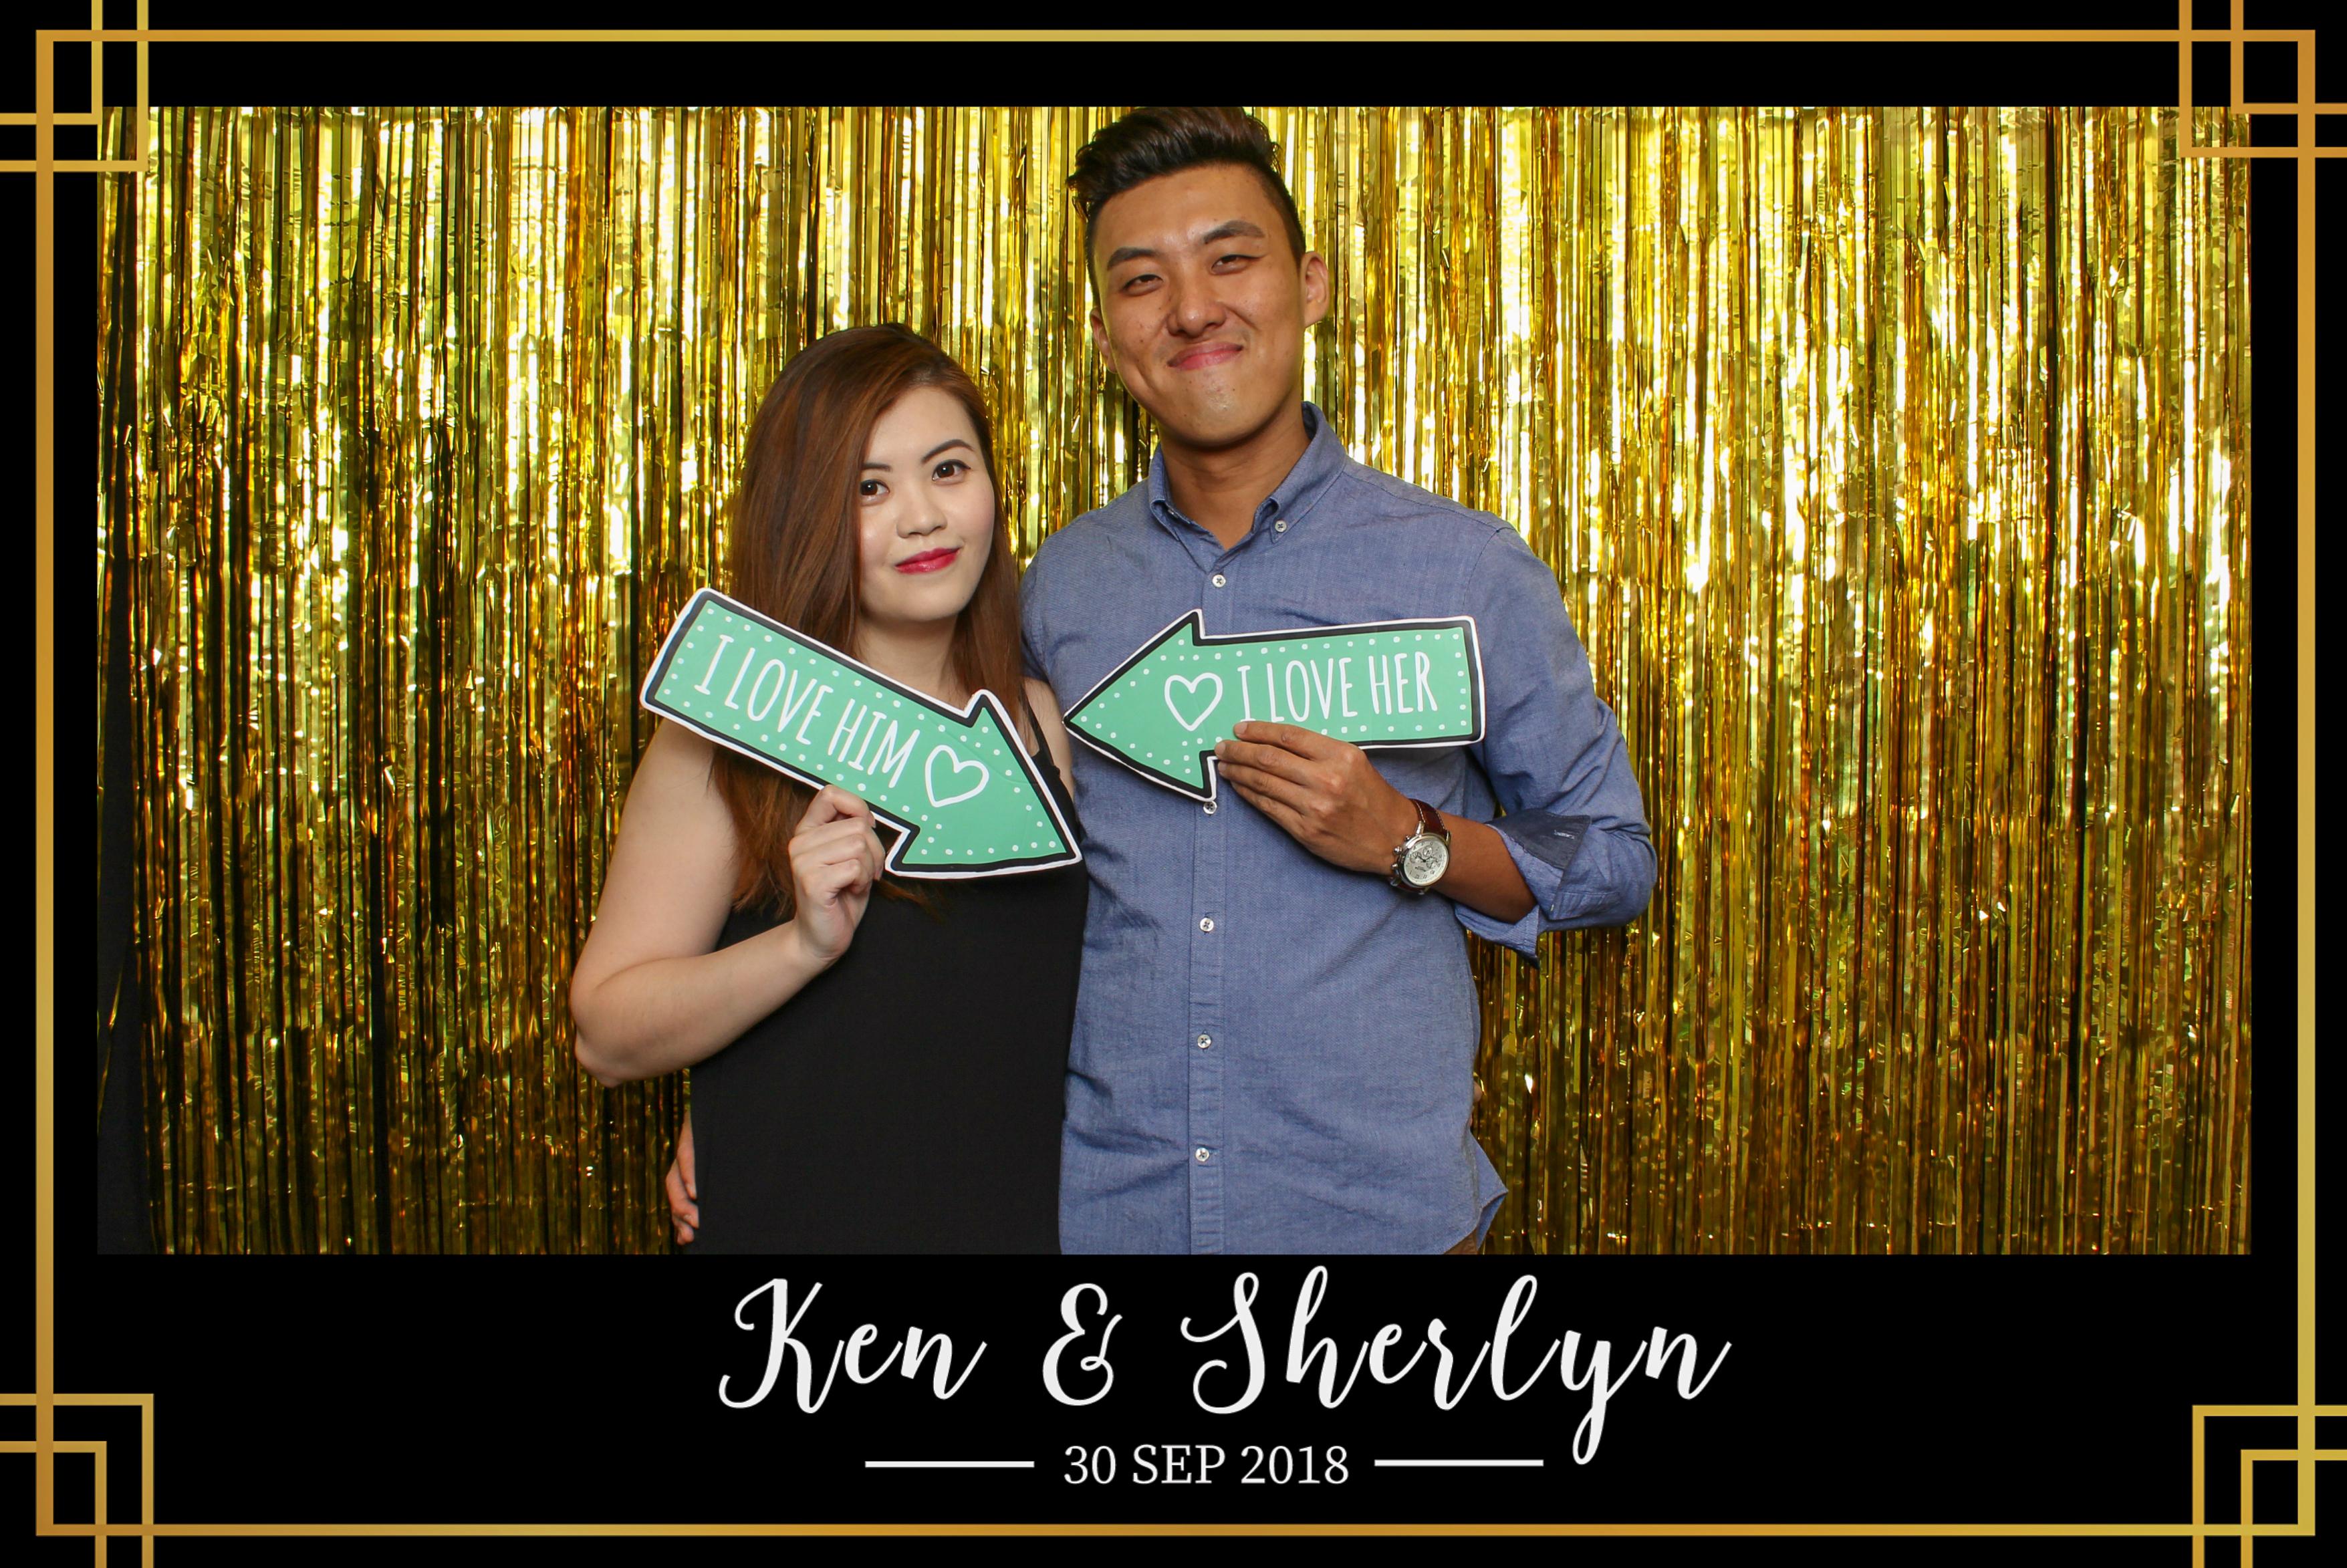 Ken Sherlyn wedding photo booth (32)